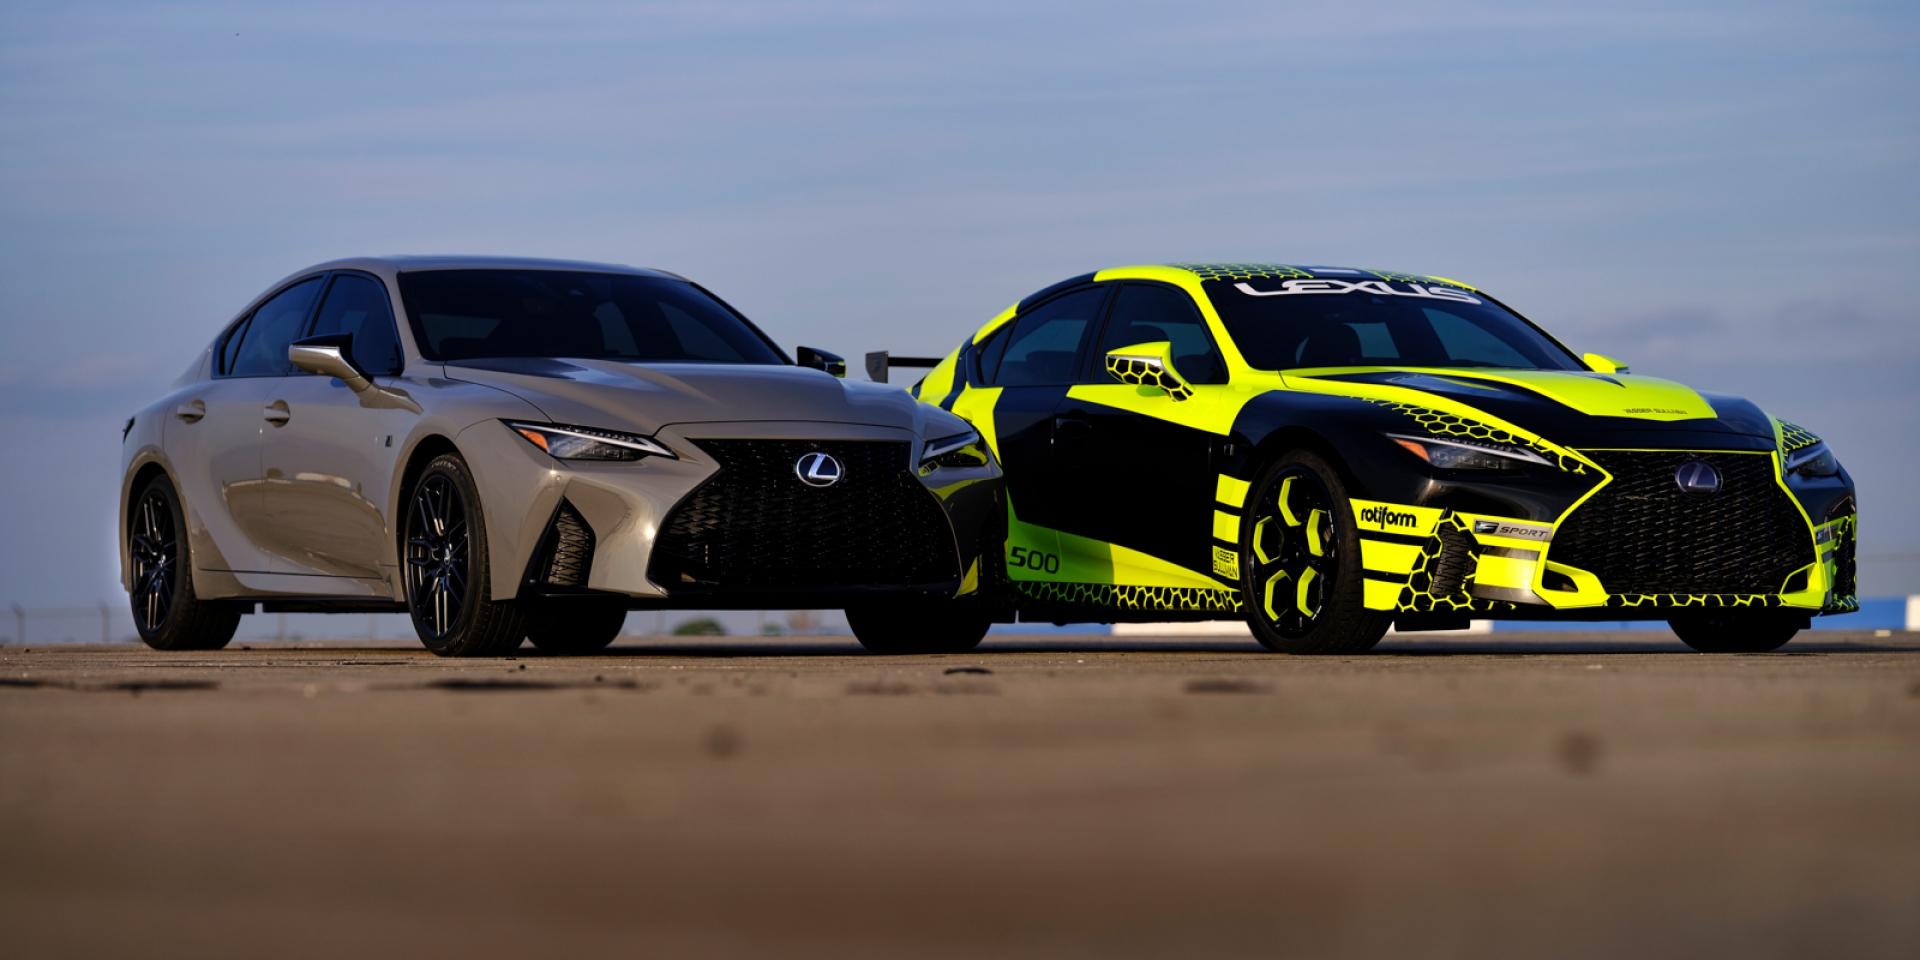 八缸尤物搞限量!Lexus IS 500 F Sport Performance Launch Edition北美限定登場